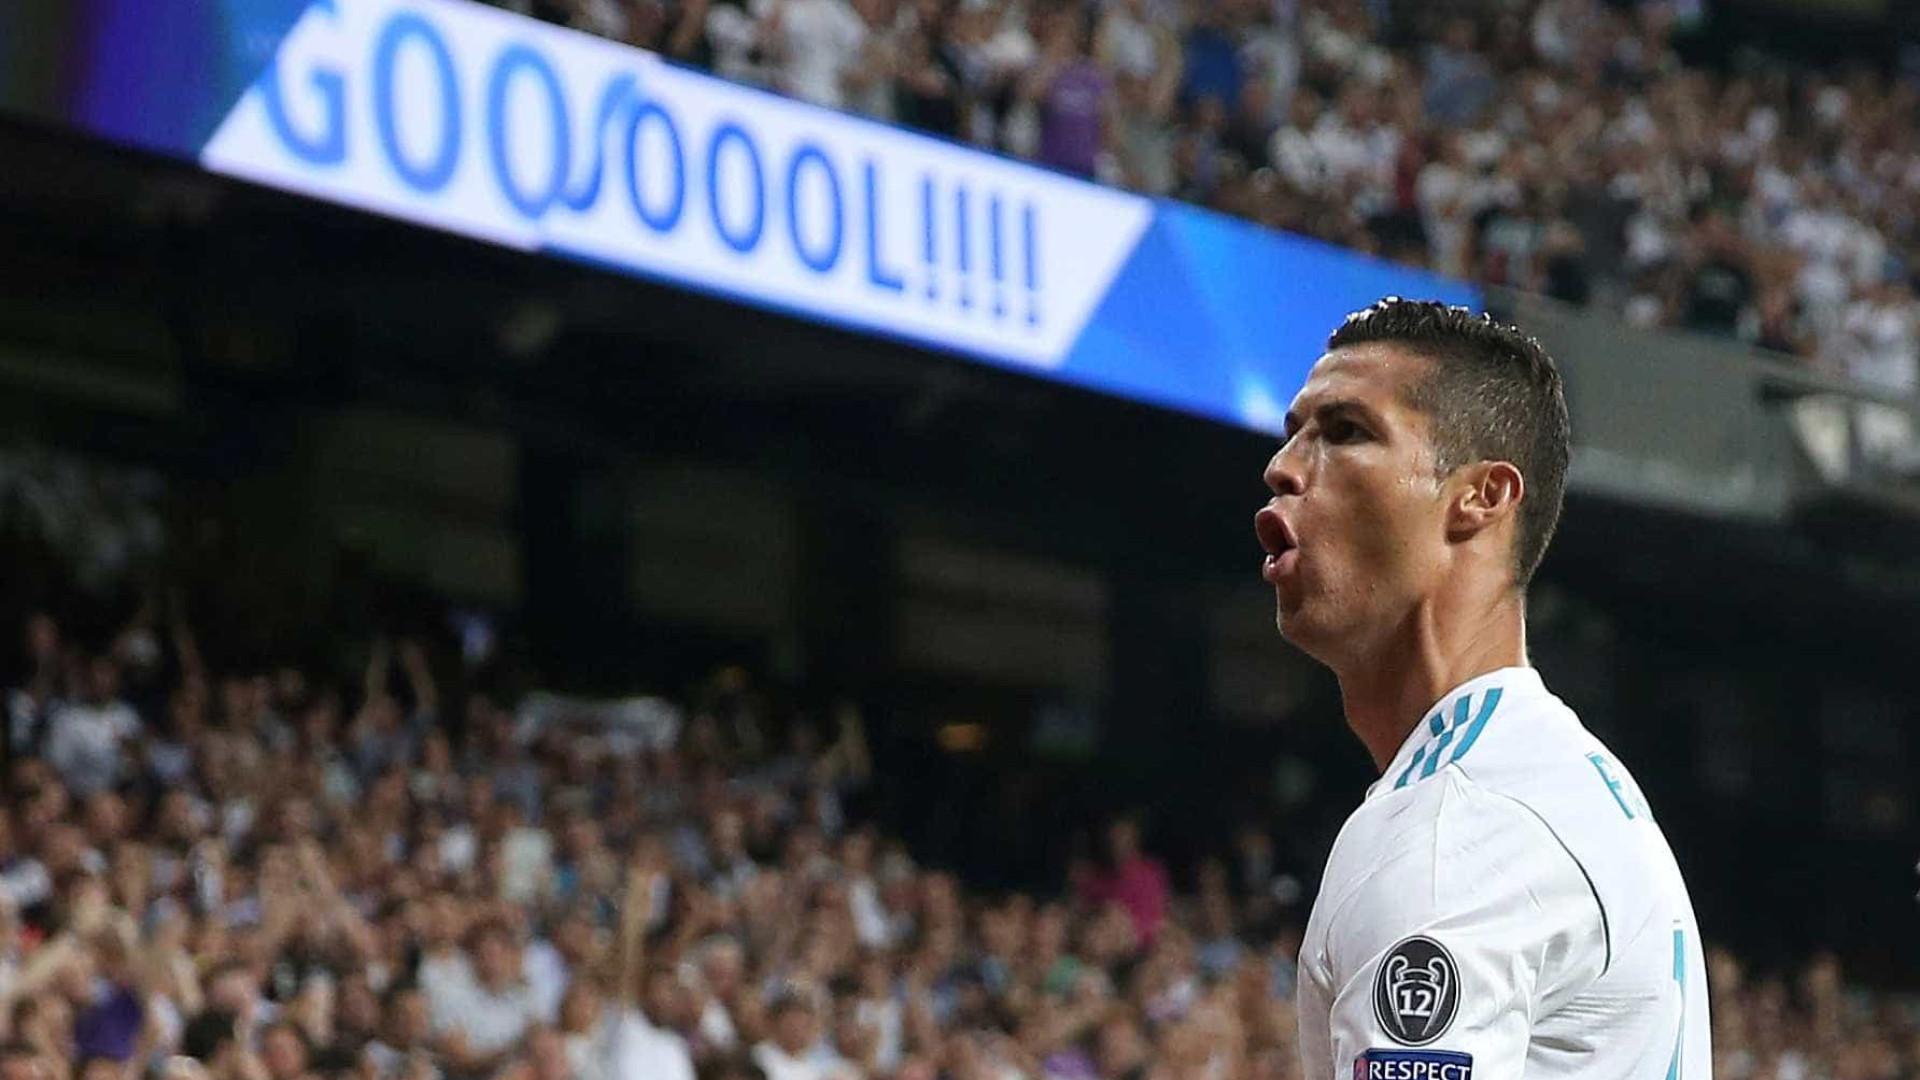 Ronaldo é finalista na corrida ao prémio The Best